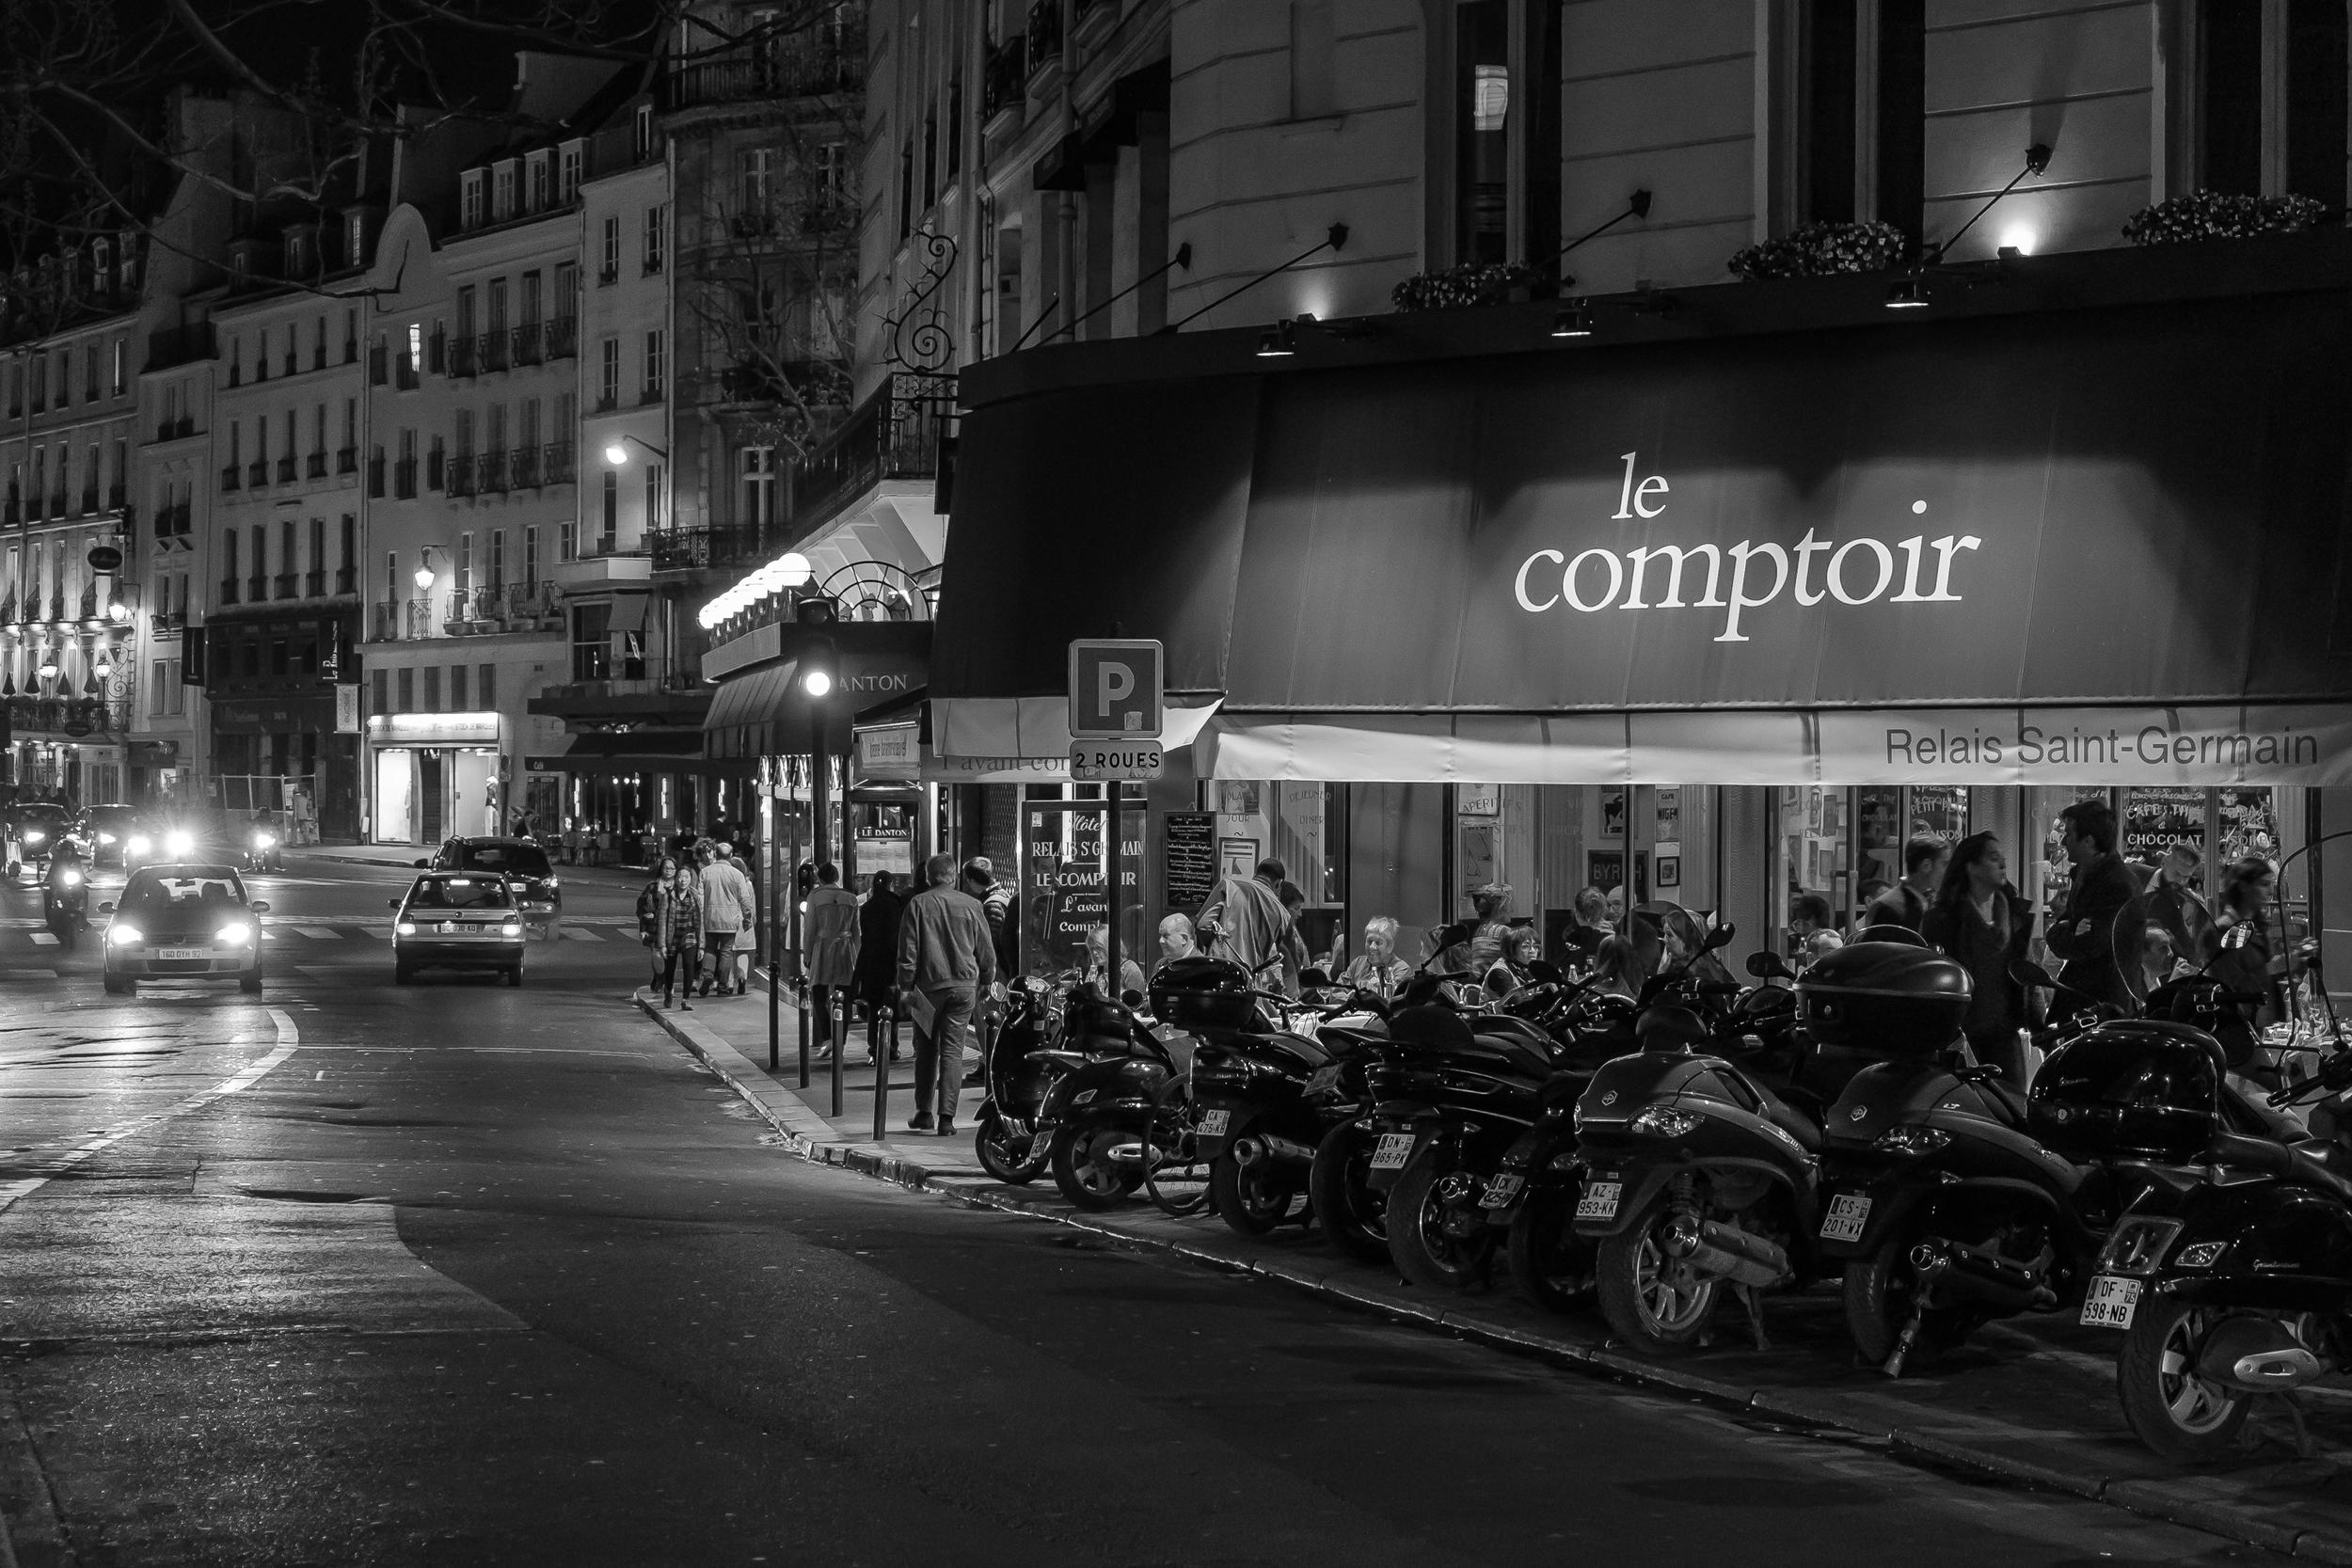 Spring evening, Le Comptoir du Relais